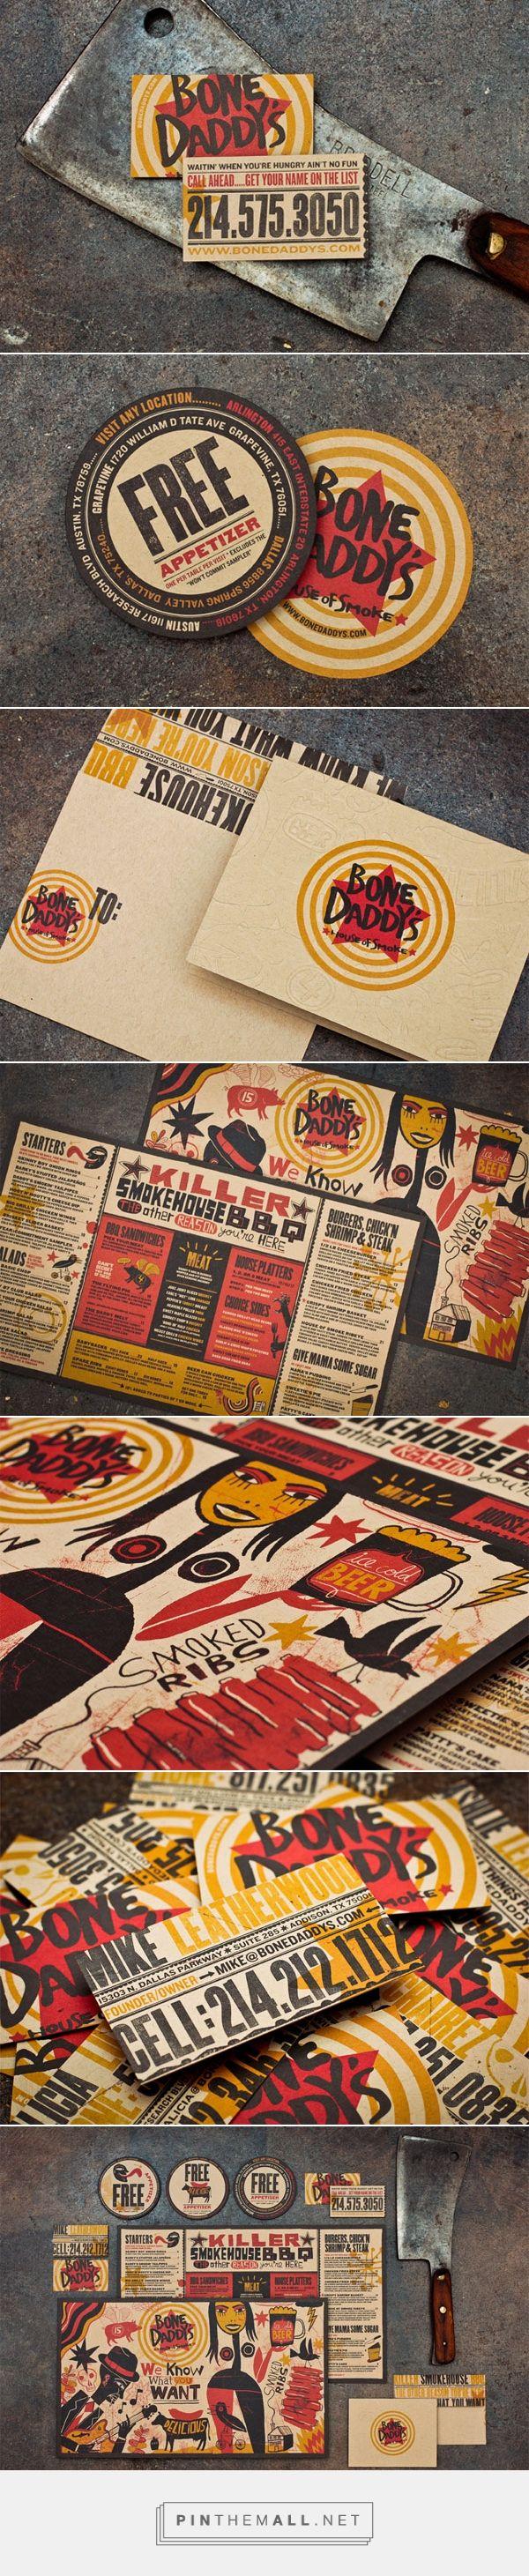 FPO: Bone Daddy's BBQ Restaurant Branding and Menu Design by Matchbox Studio   Fivestar Branding Agency – Design and Branding Agency & Curated Inspiration Gallery